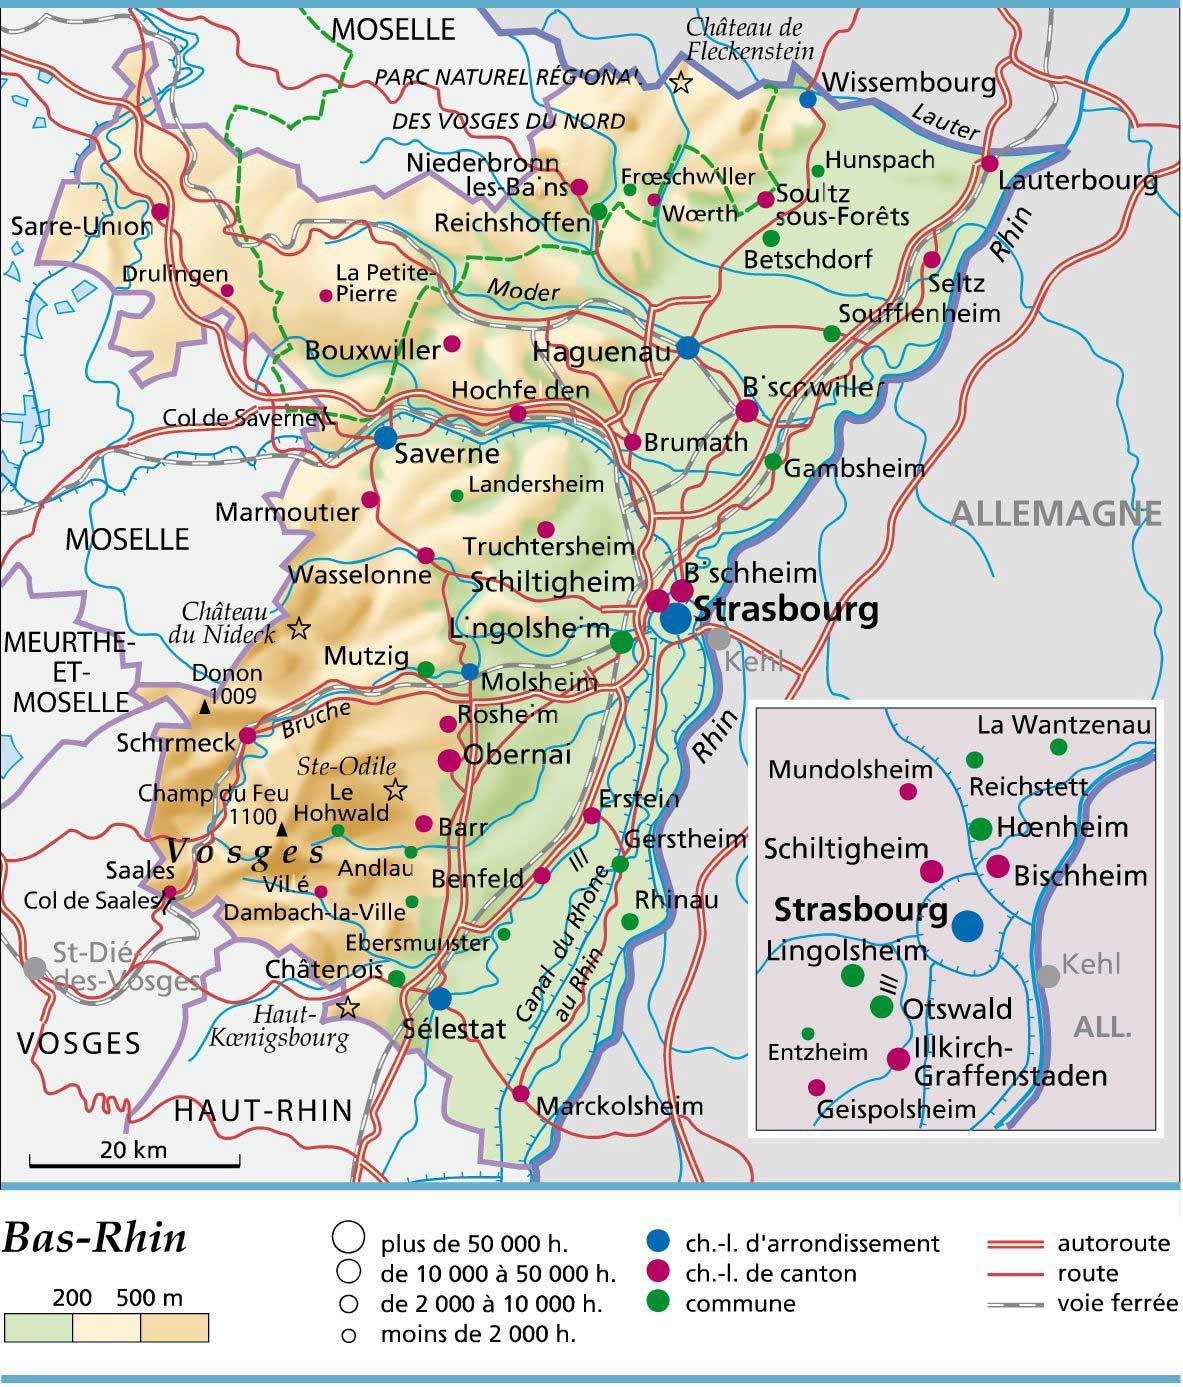 Carte Geographique Alsace Bas Rhin.Bas Rhin Departement 67 Vacances Arts Guides Voyages